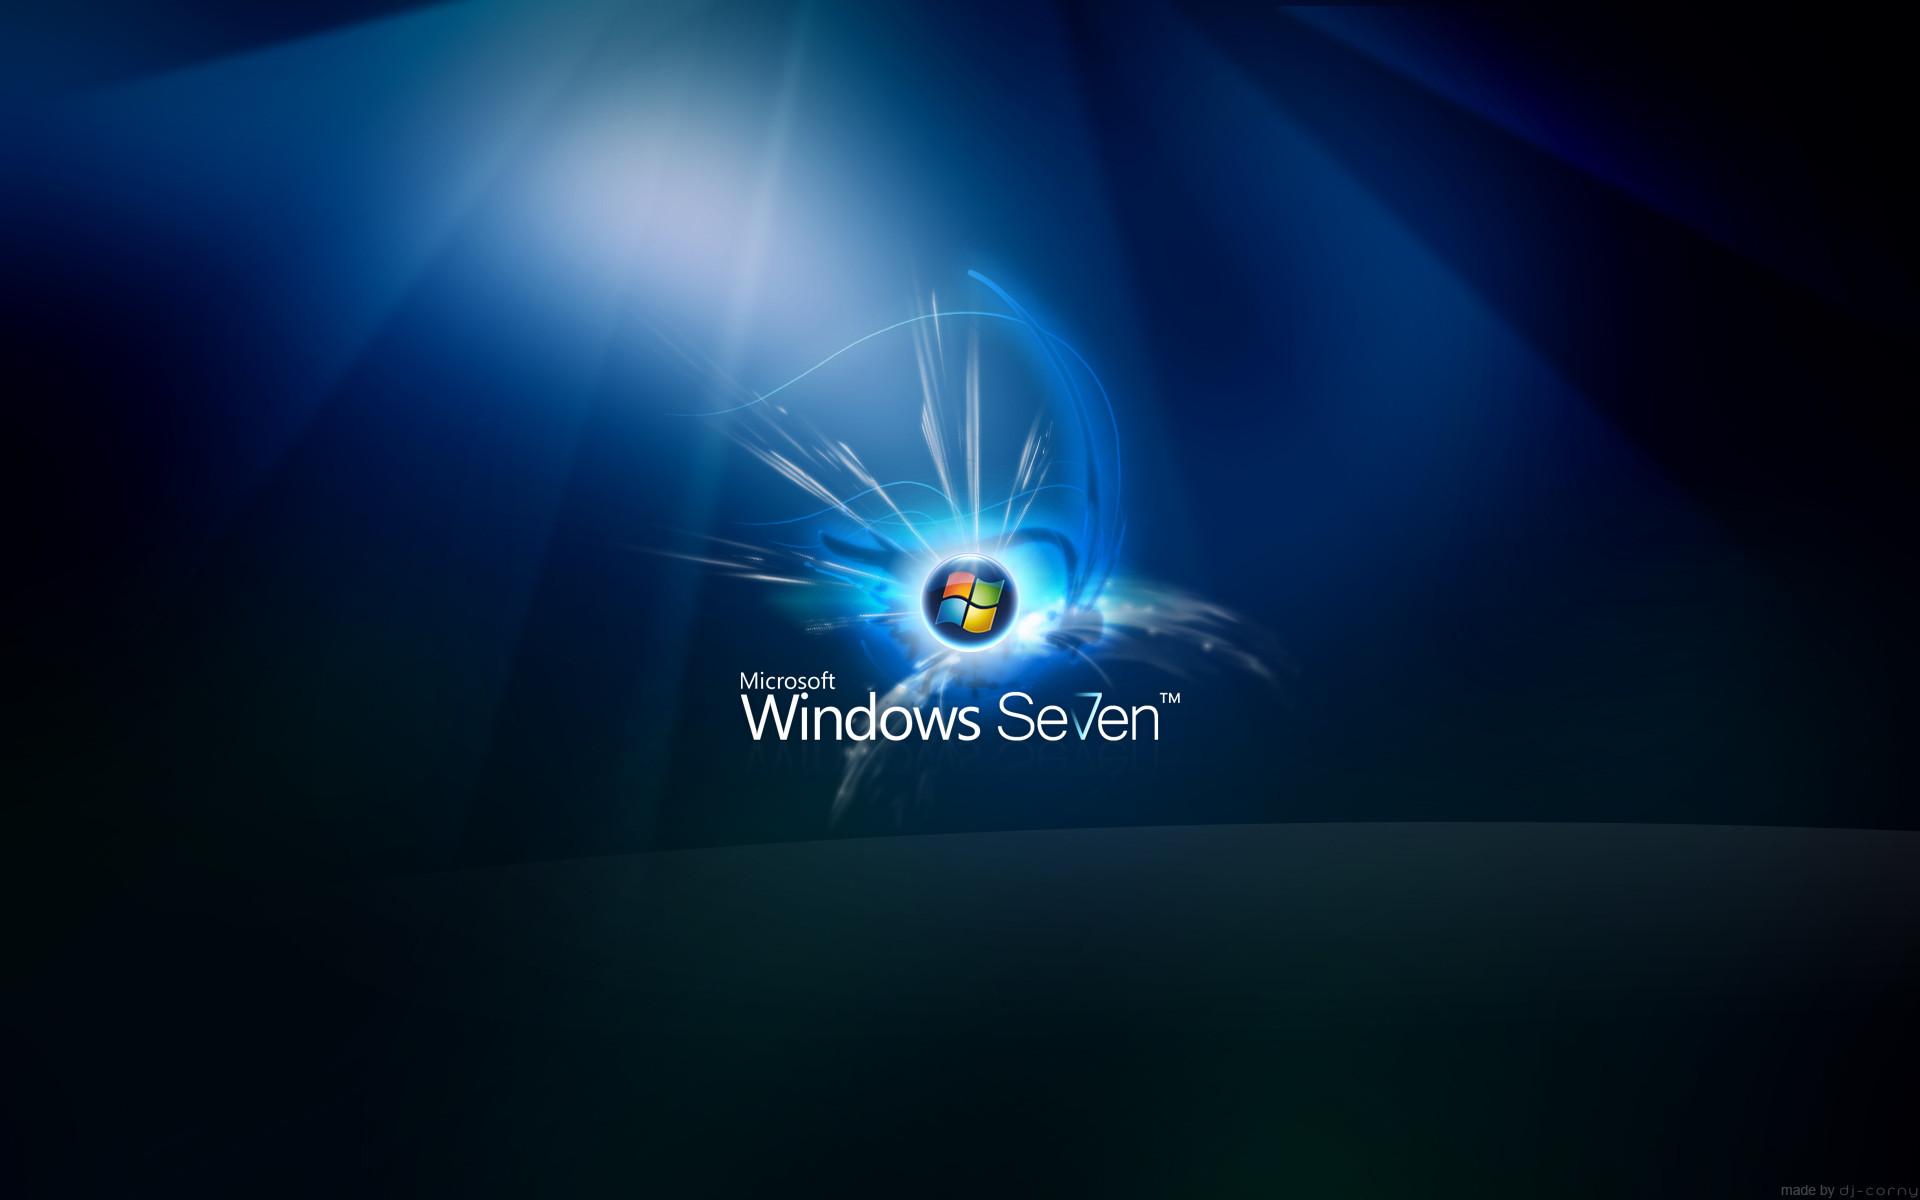 Change Desktop Background Windows 7 Starter Download All About